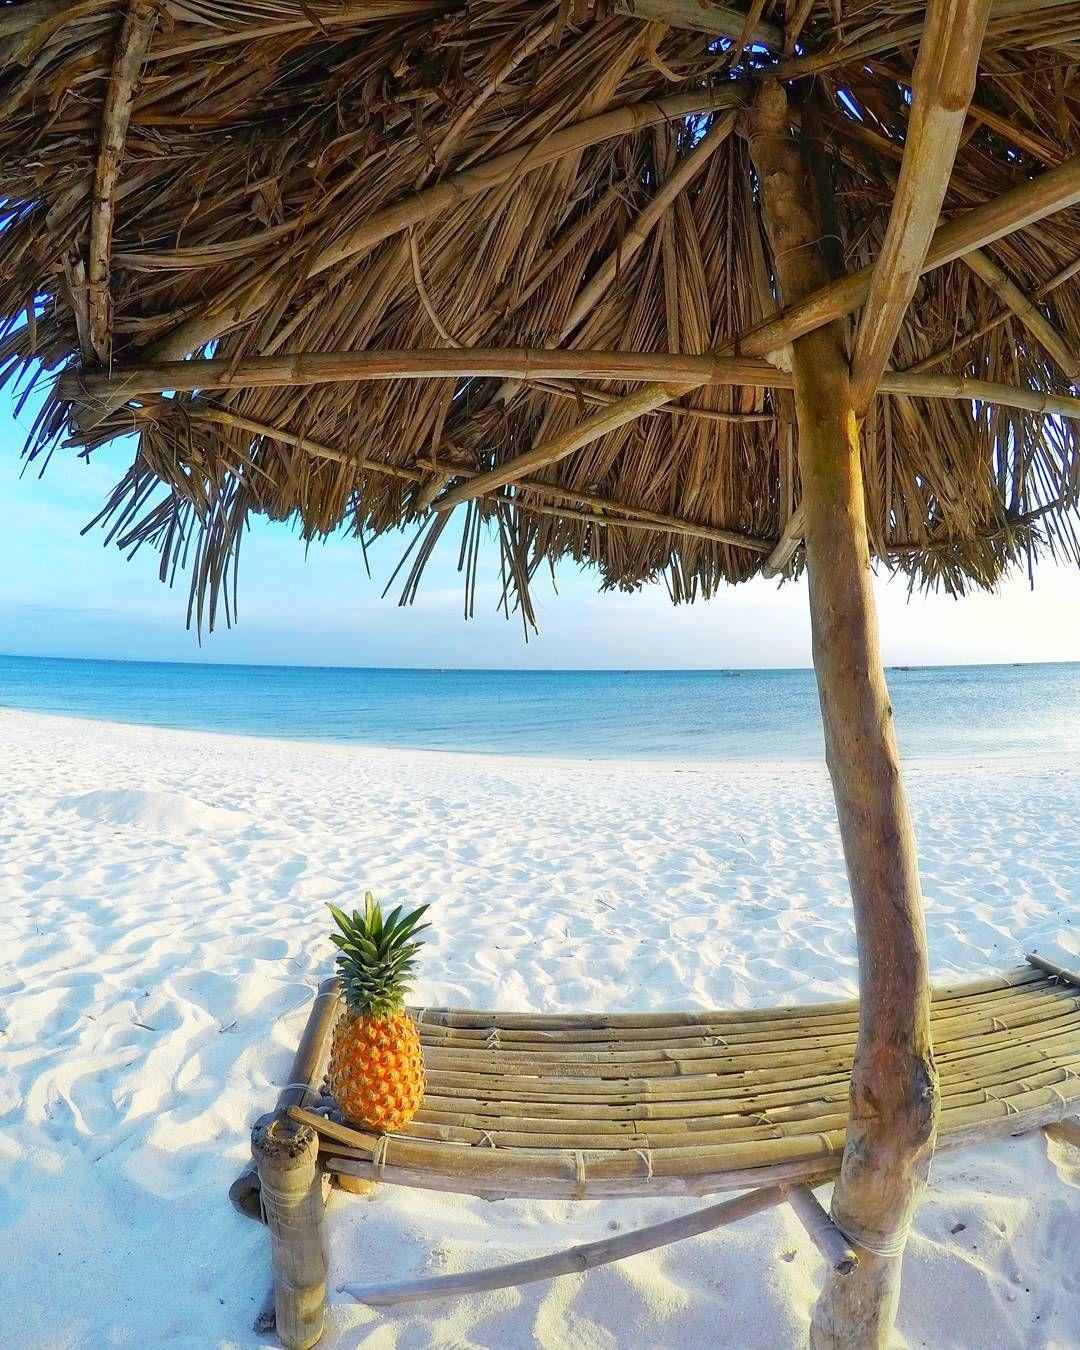 Paradise Beach Bantayan Island Cebu Philippines Orte Urlaub See